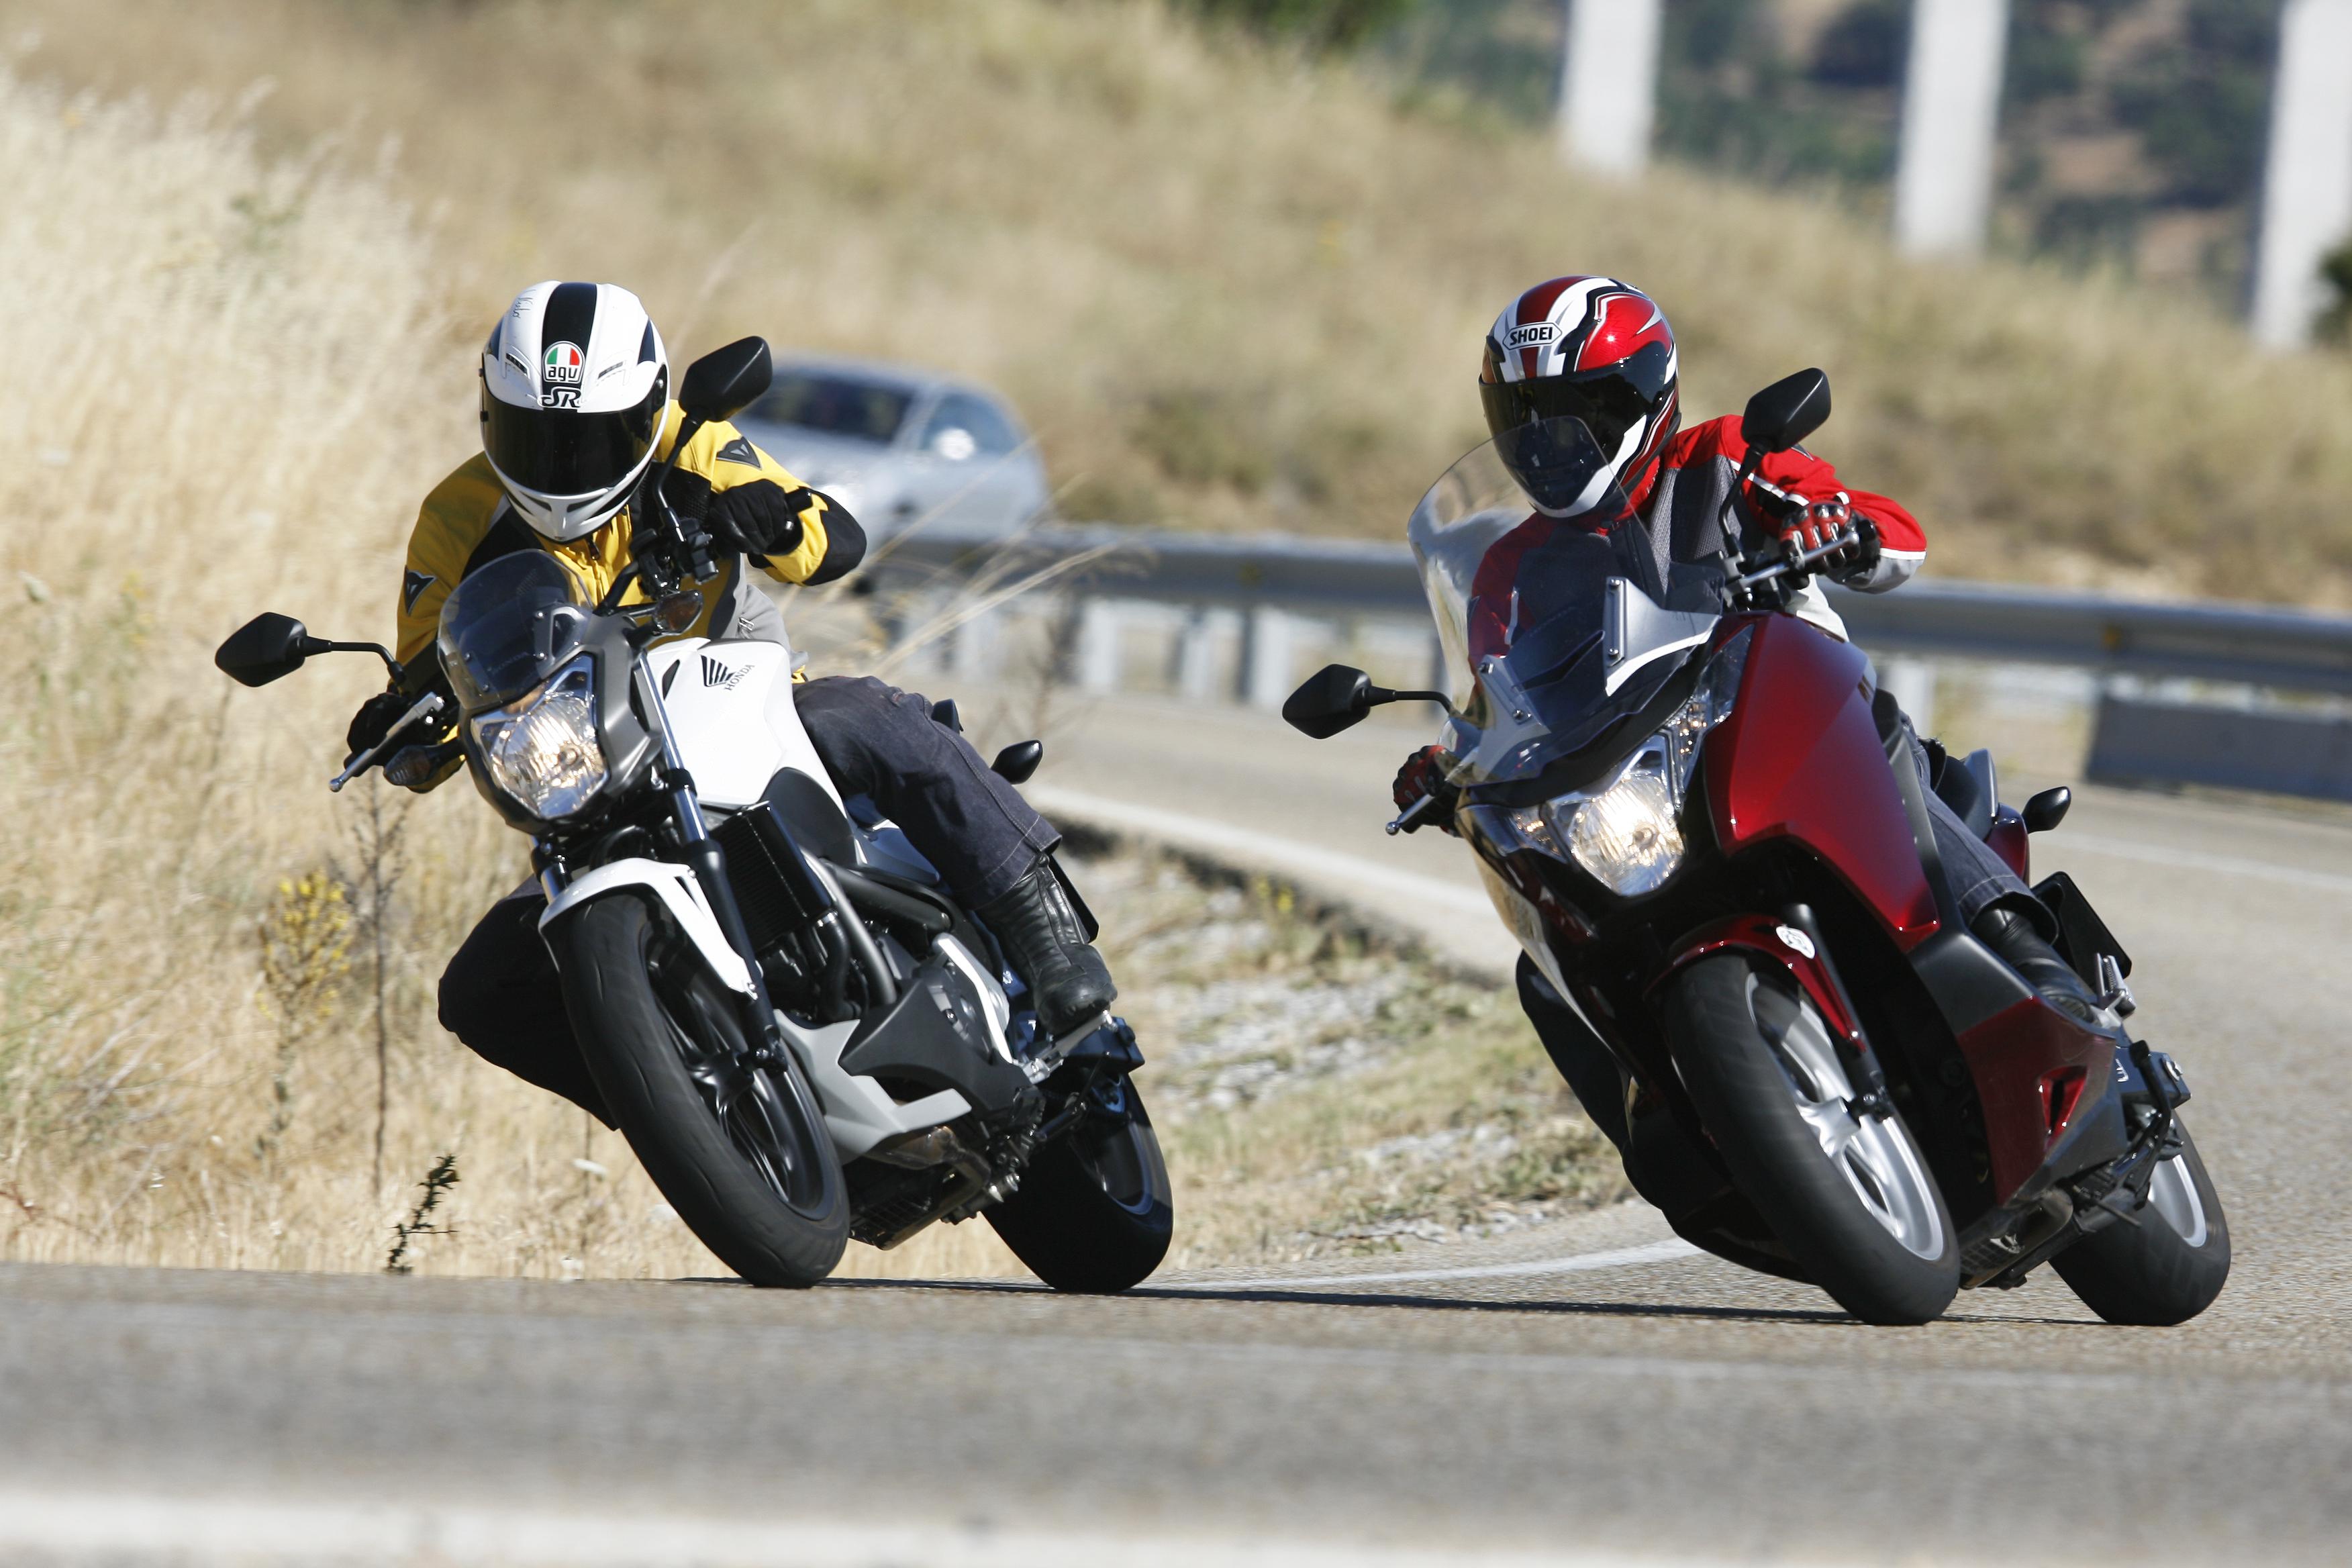 Comparativa Honda Integra vs Honda NC700S ABS DCT